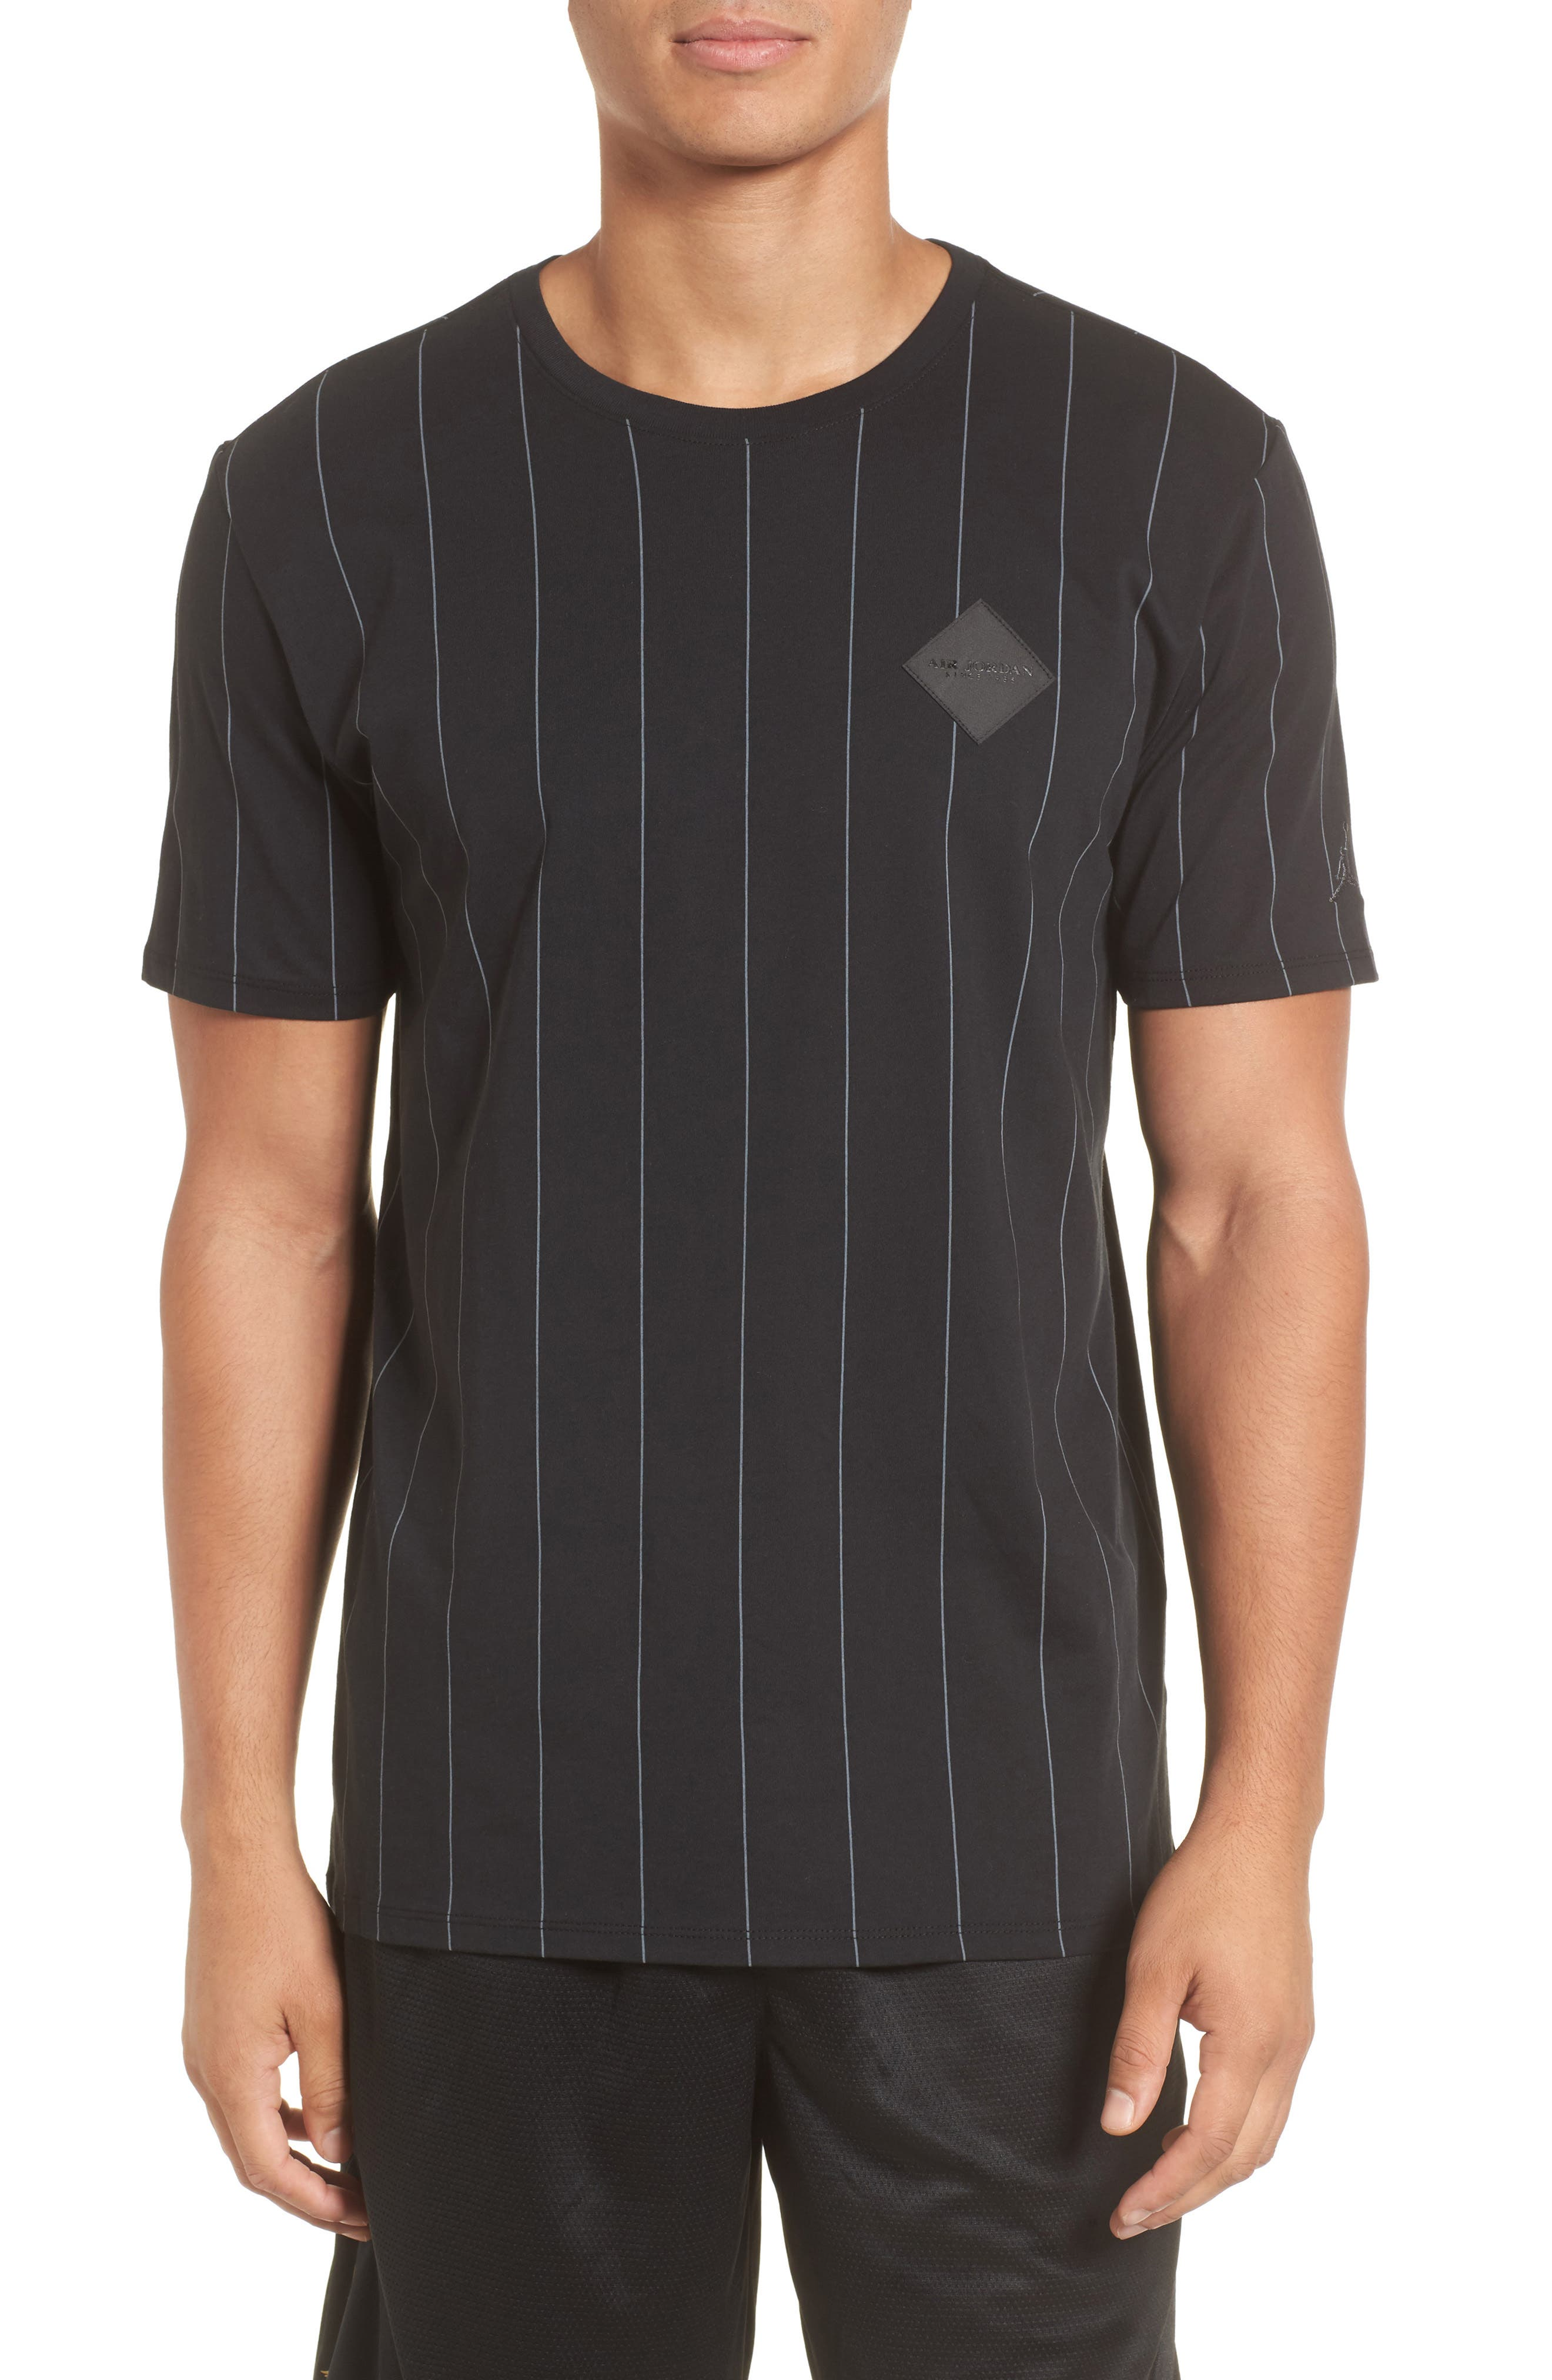 Sportswear AJ 9 T-Shirt,                             Main thumbnail 1, color,                             010